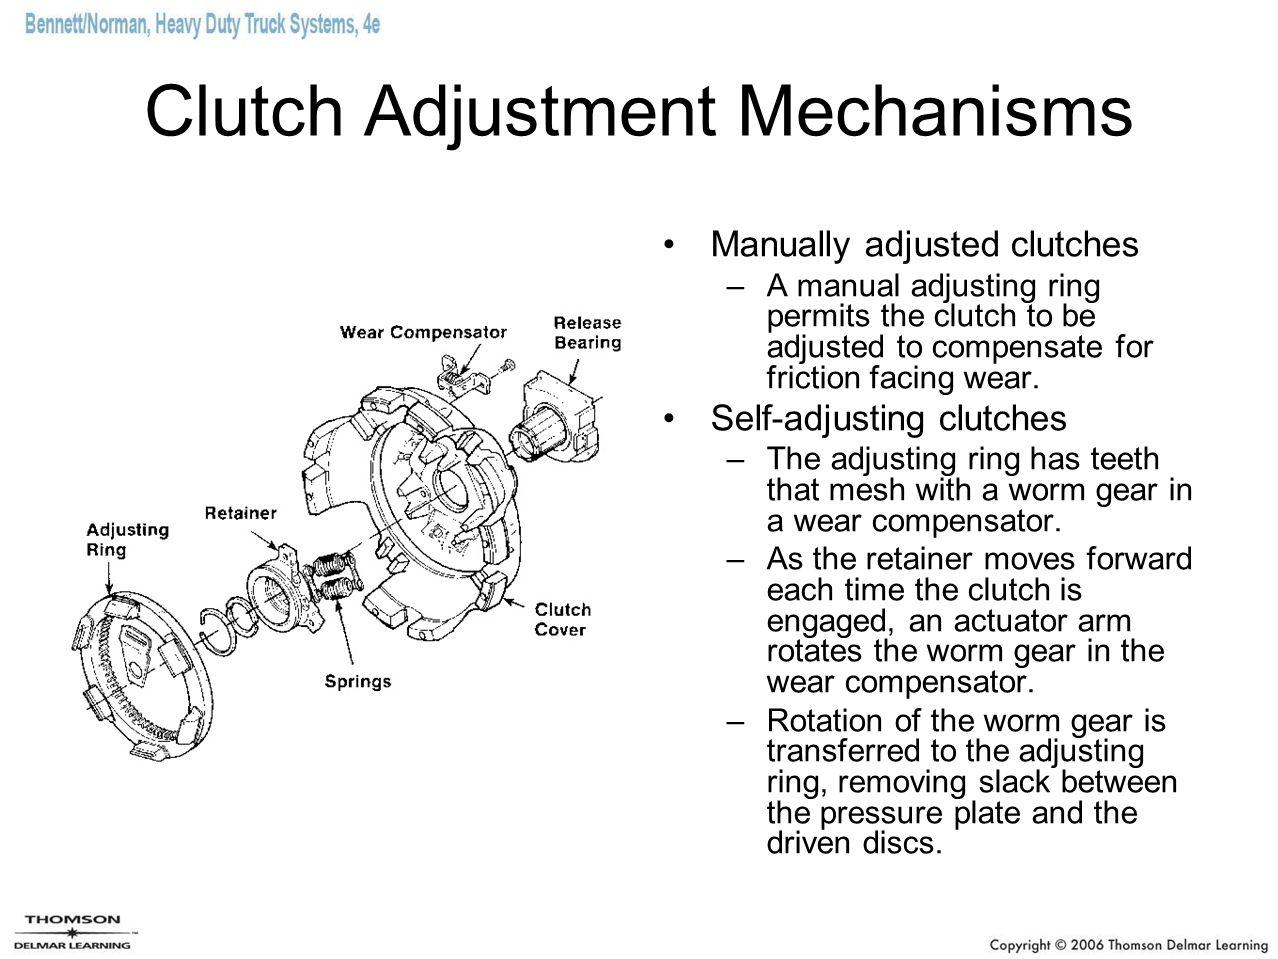 Hydraulic Clutch Linkage The clutch is disengaged by hydraulic fluid pressure sometimes assisted by an air servo cylinder.